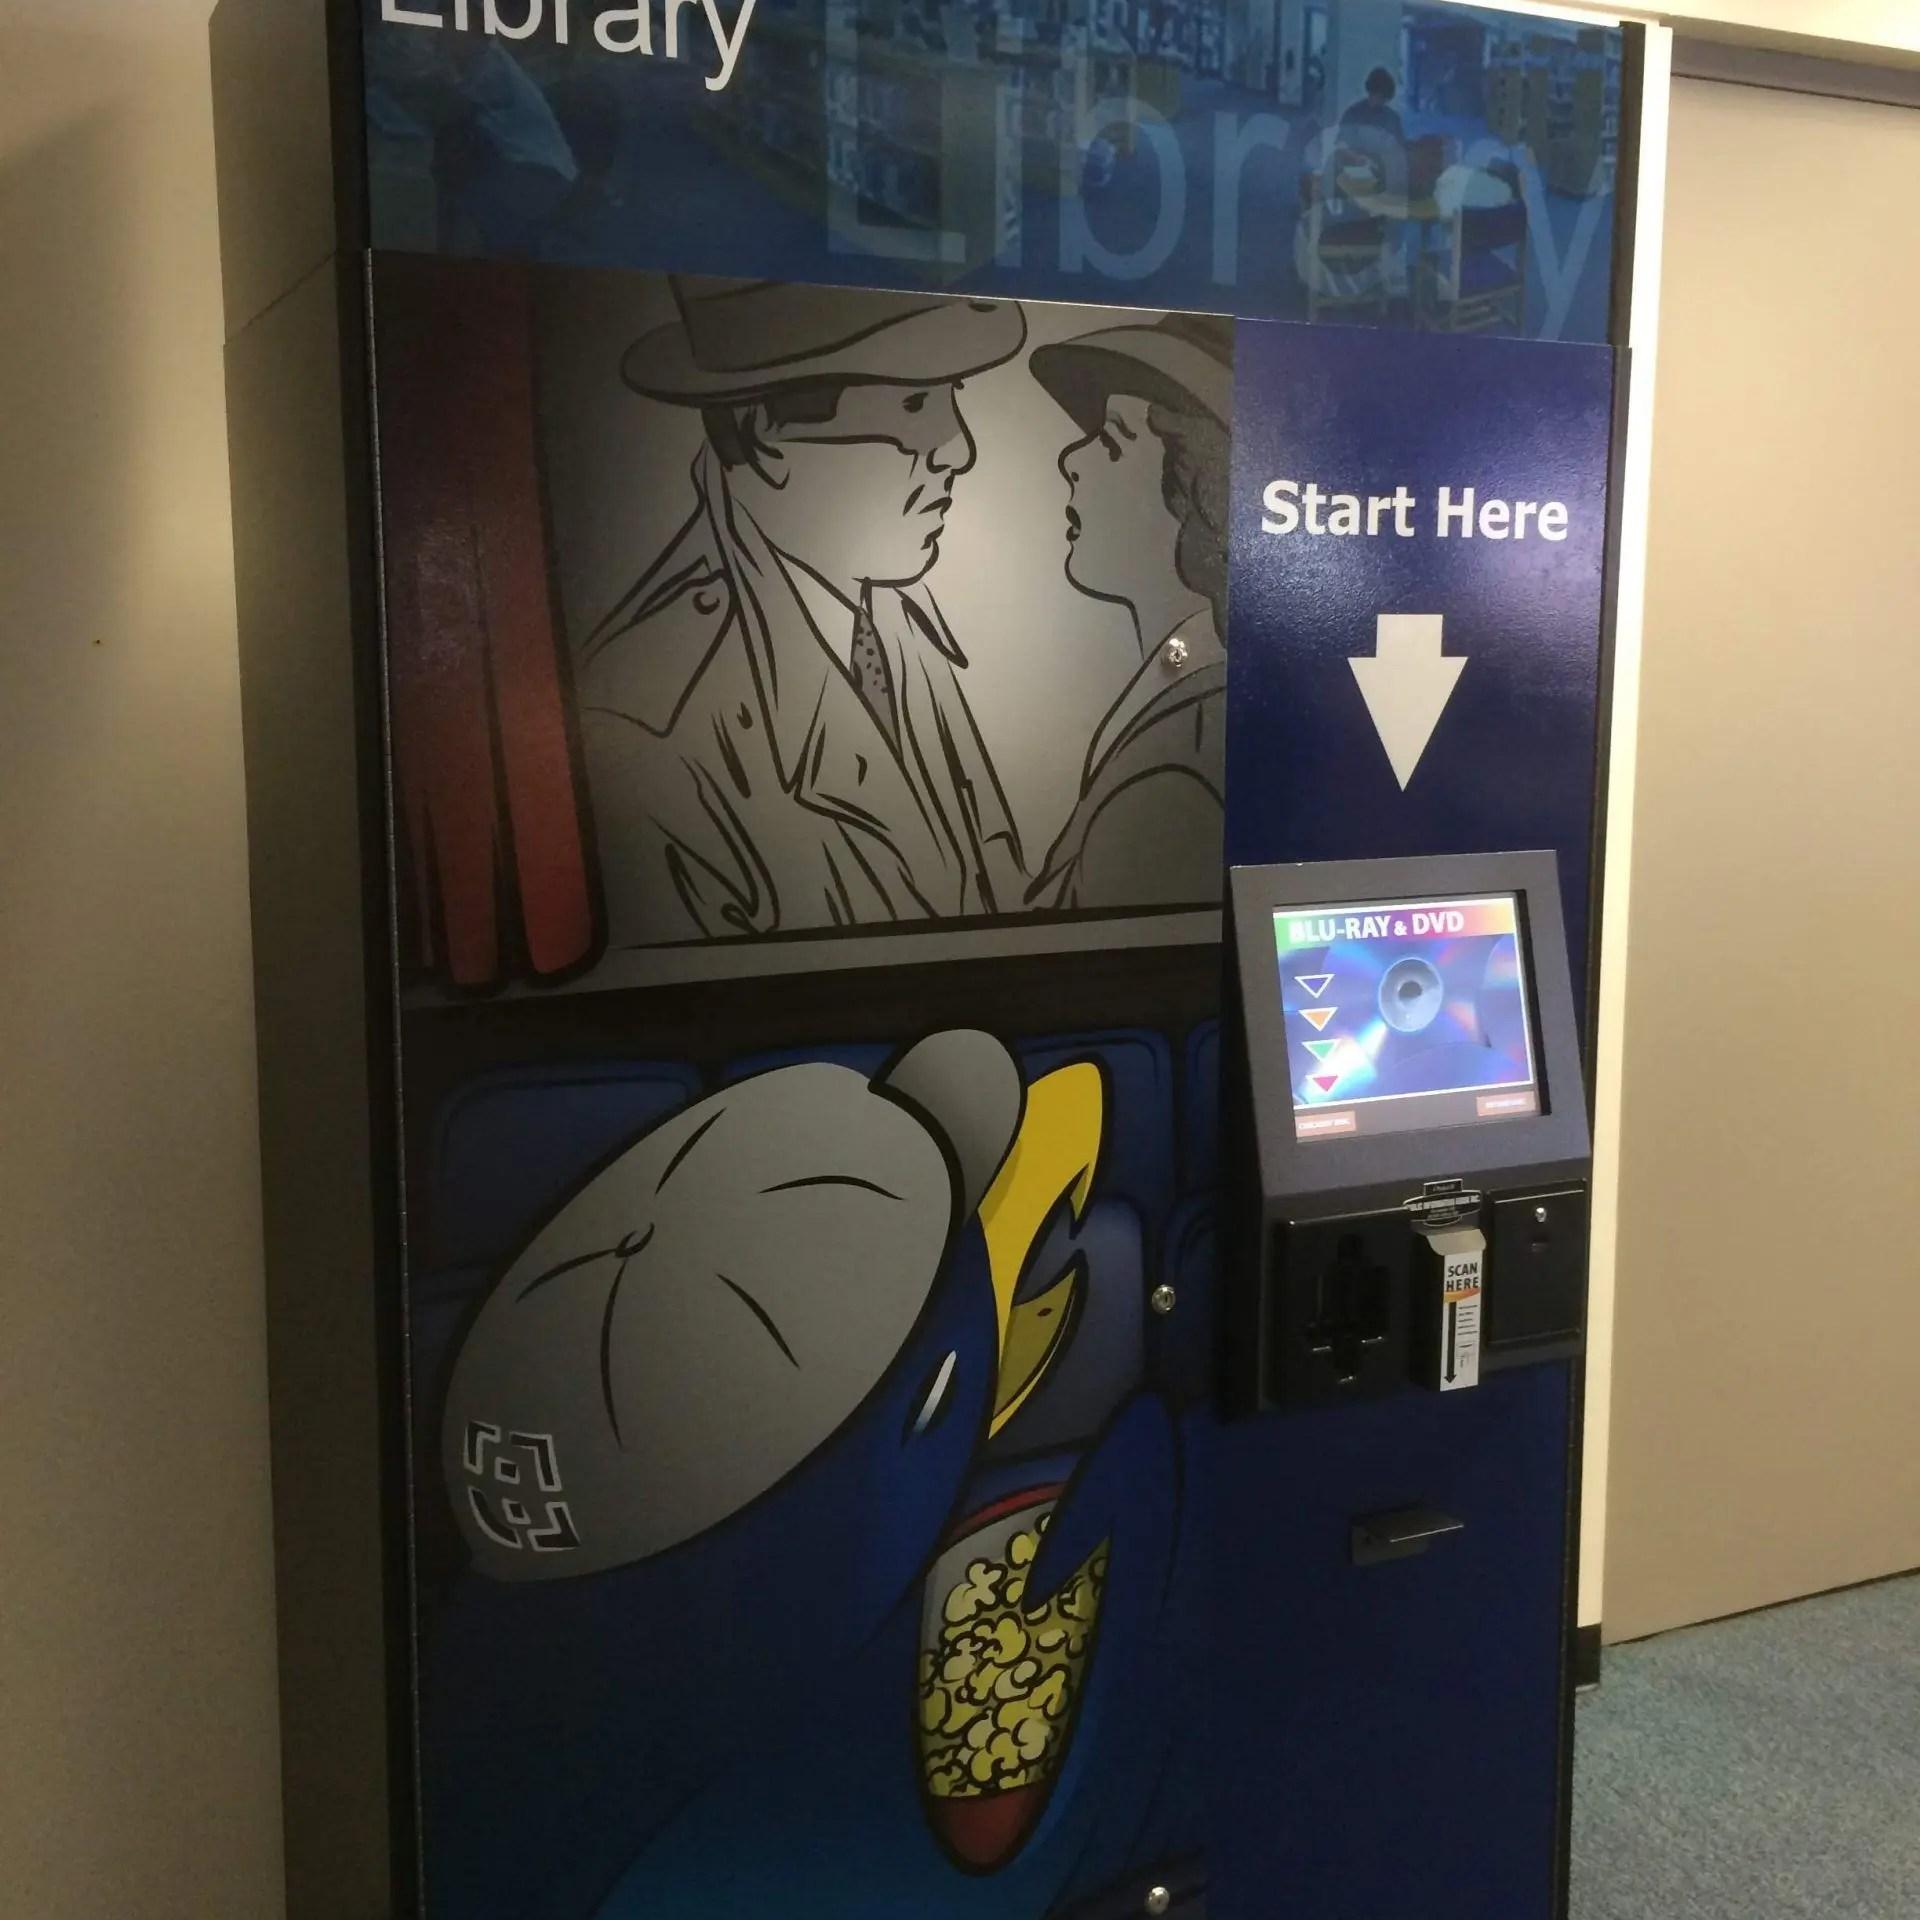 movie rental kiosk for libaries